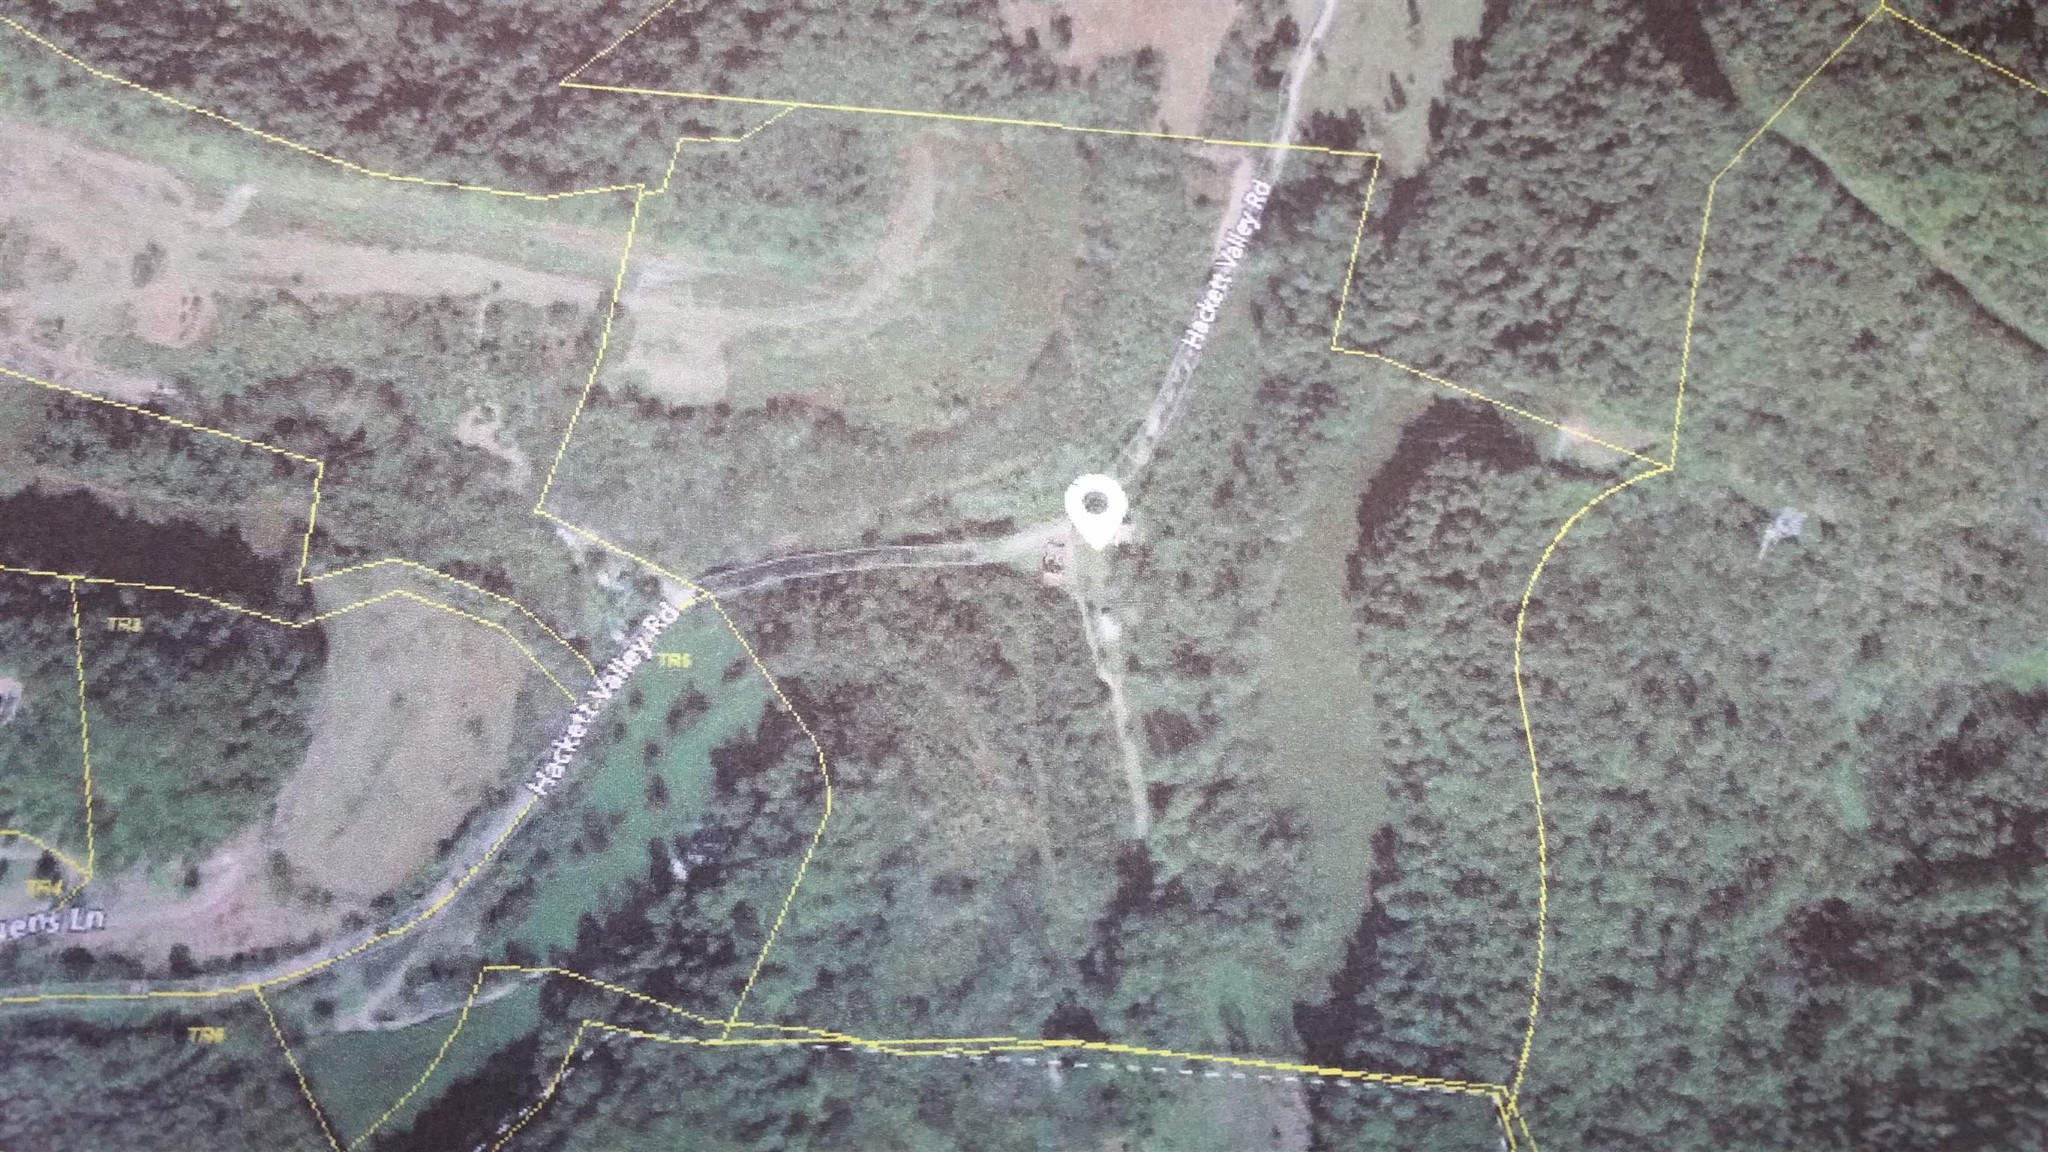 153 Hackett Valley Rd, Hickman, TN 38567 - Hickman, TN real estate listing